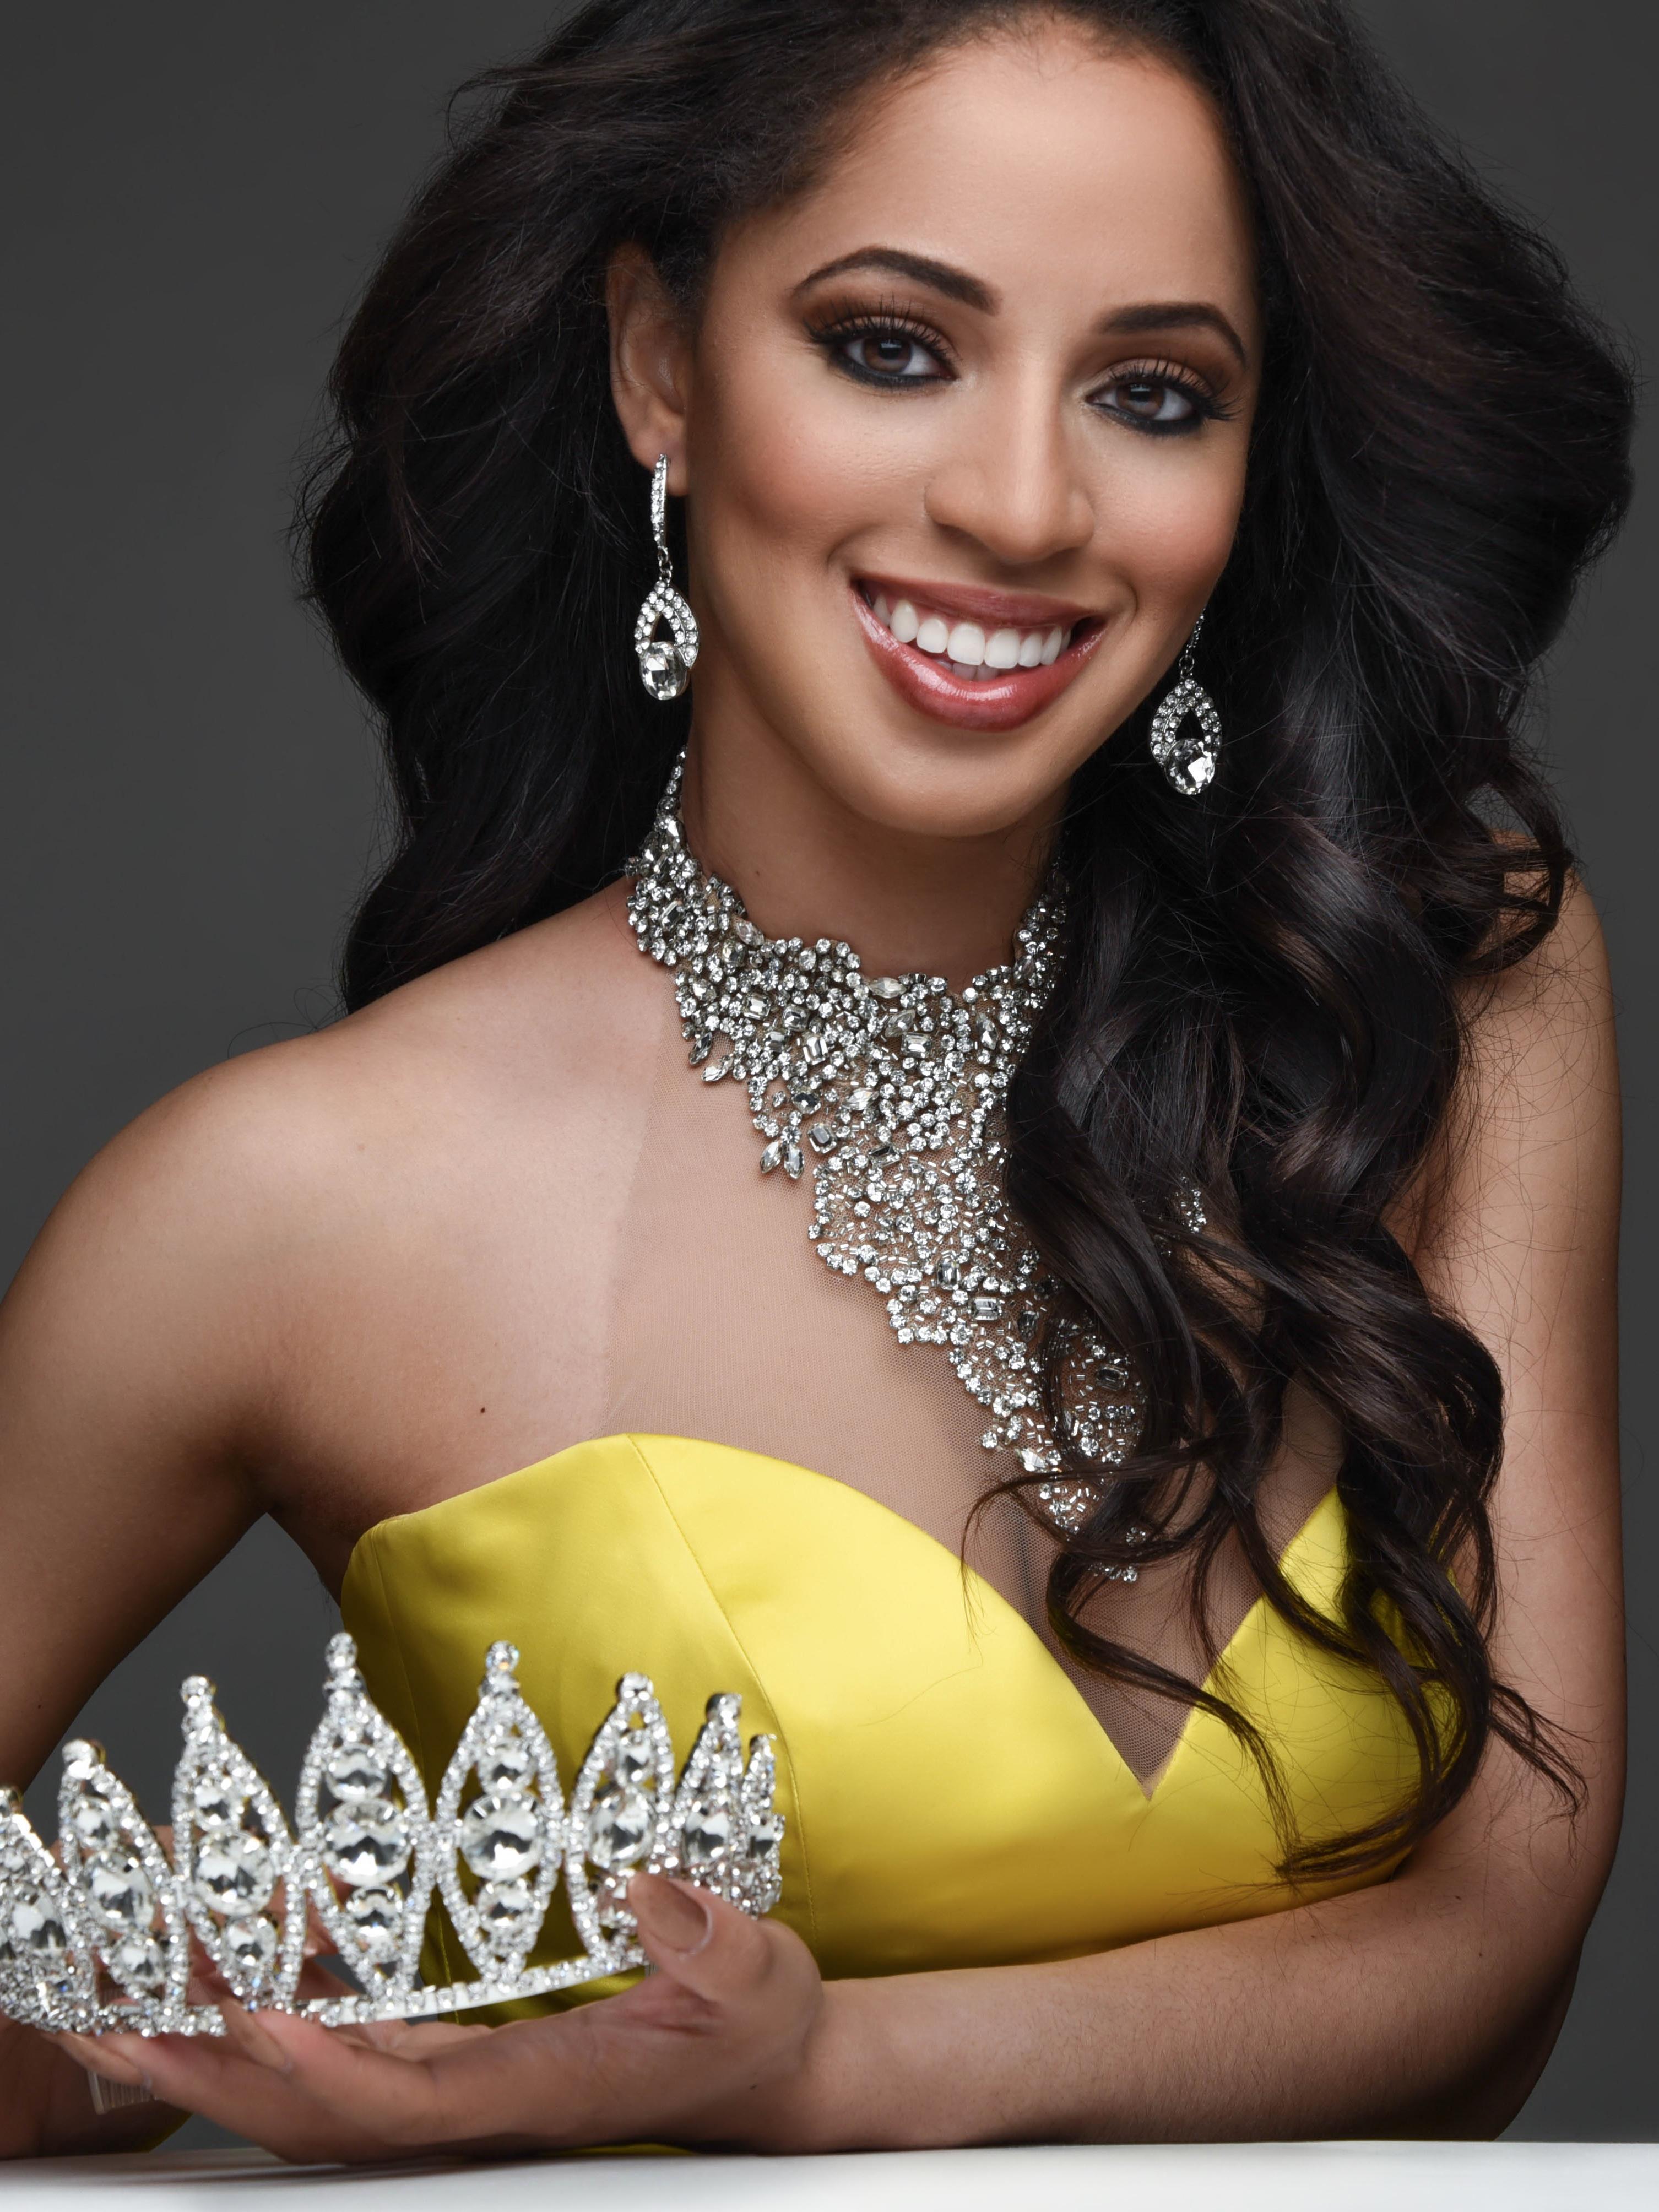 Candidatas a Miss Grand Estados Unidos de América 2017 * FINAL 25 DE JULIO - Página 2 Cwilliamscrown3